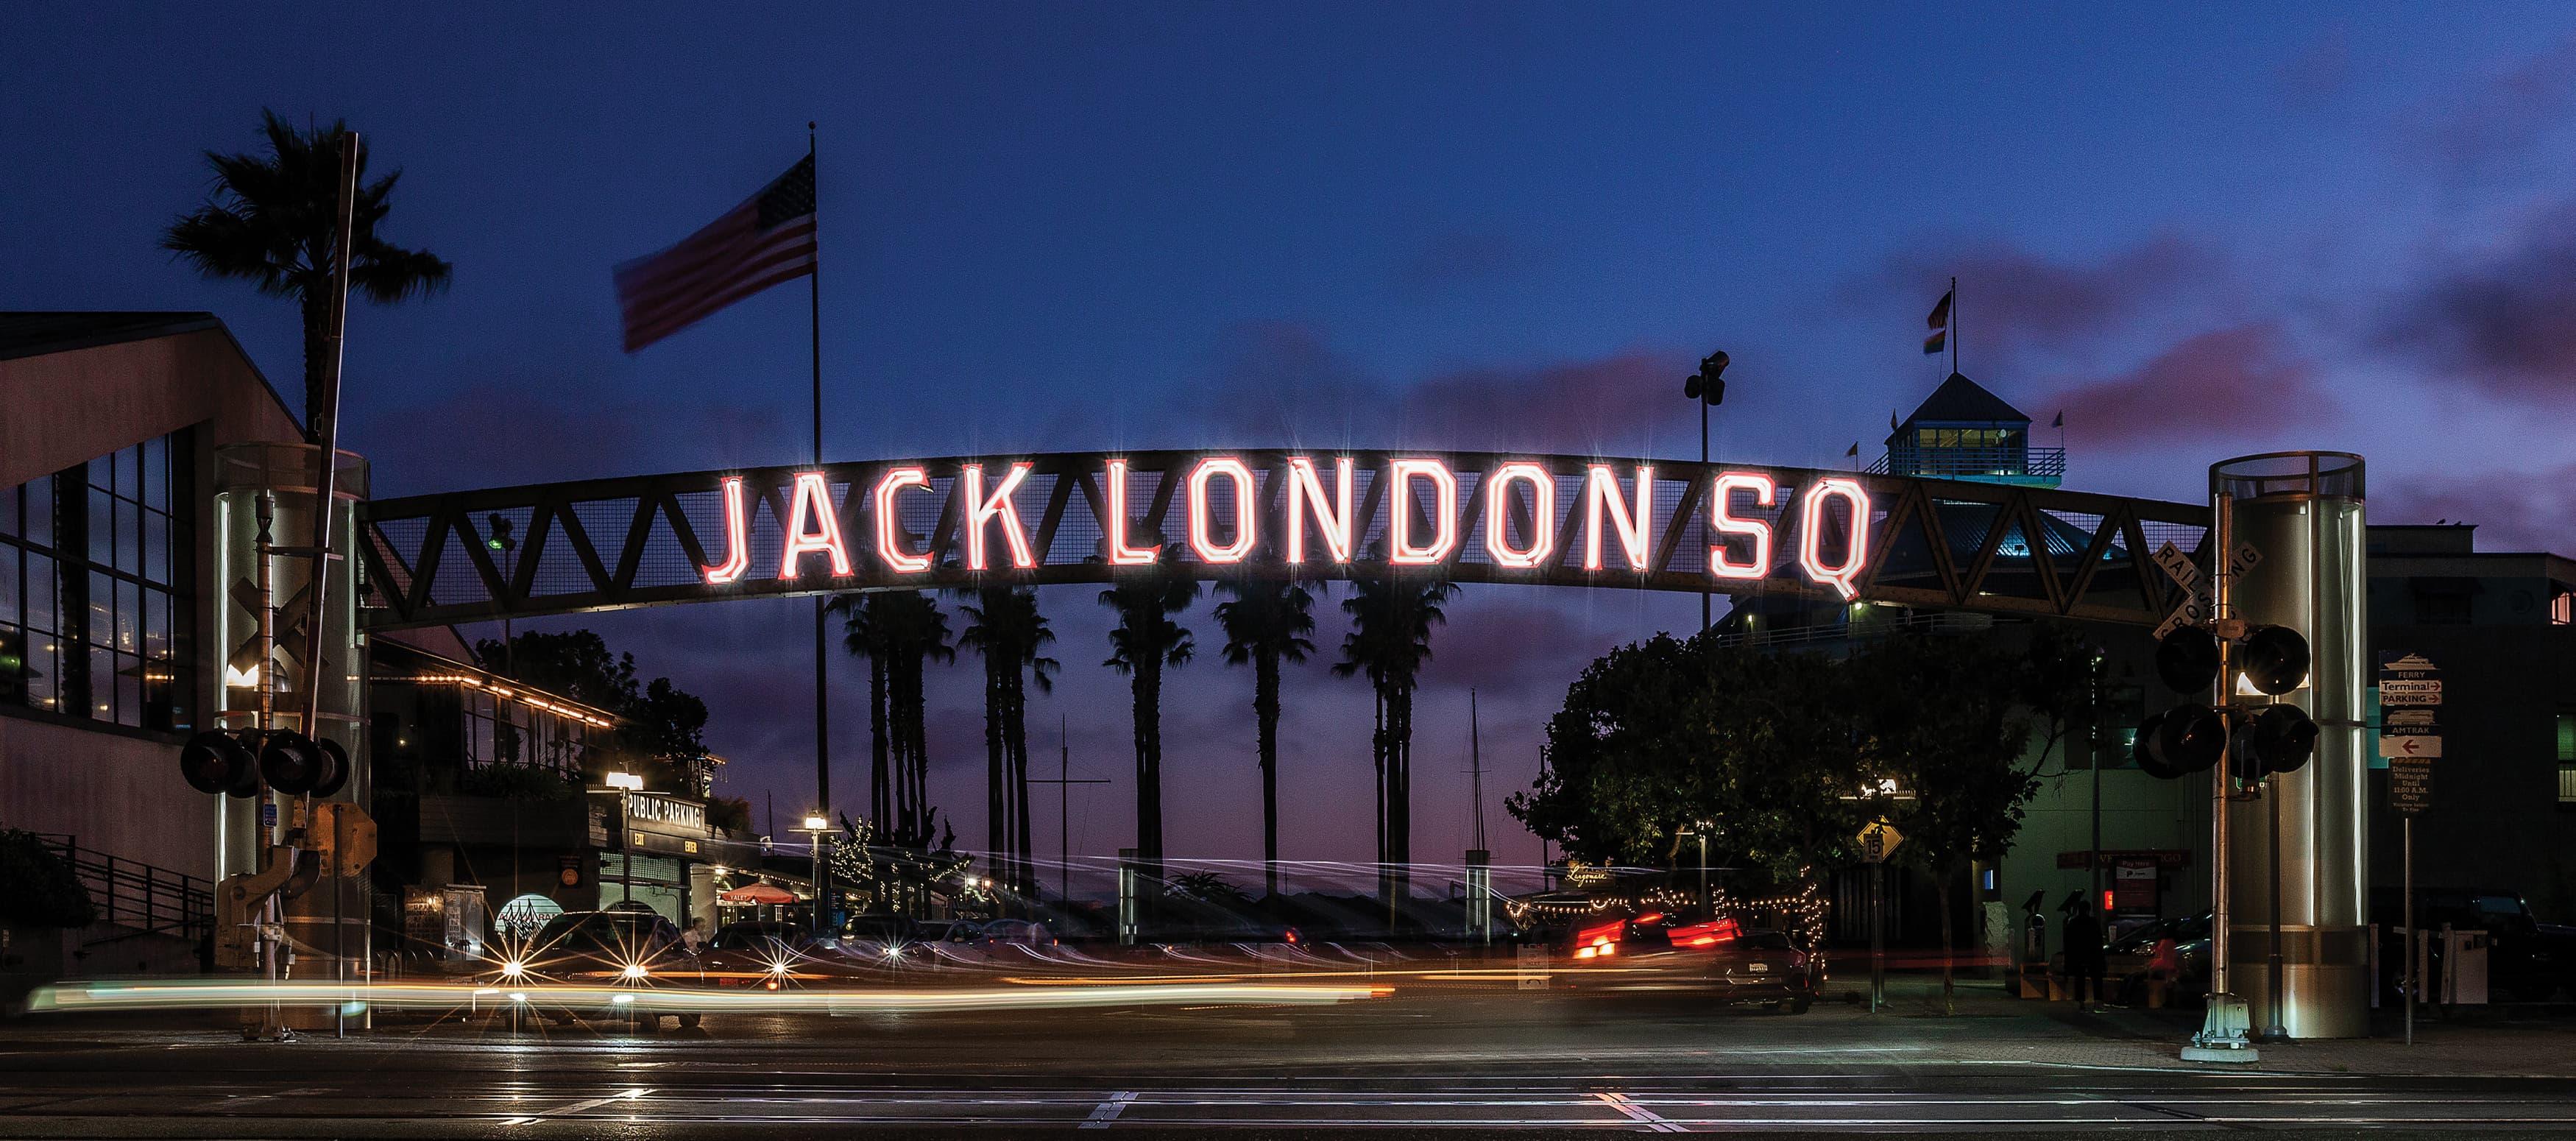 illuminated overhead street sign at night behind railroad tracks